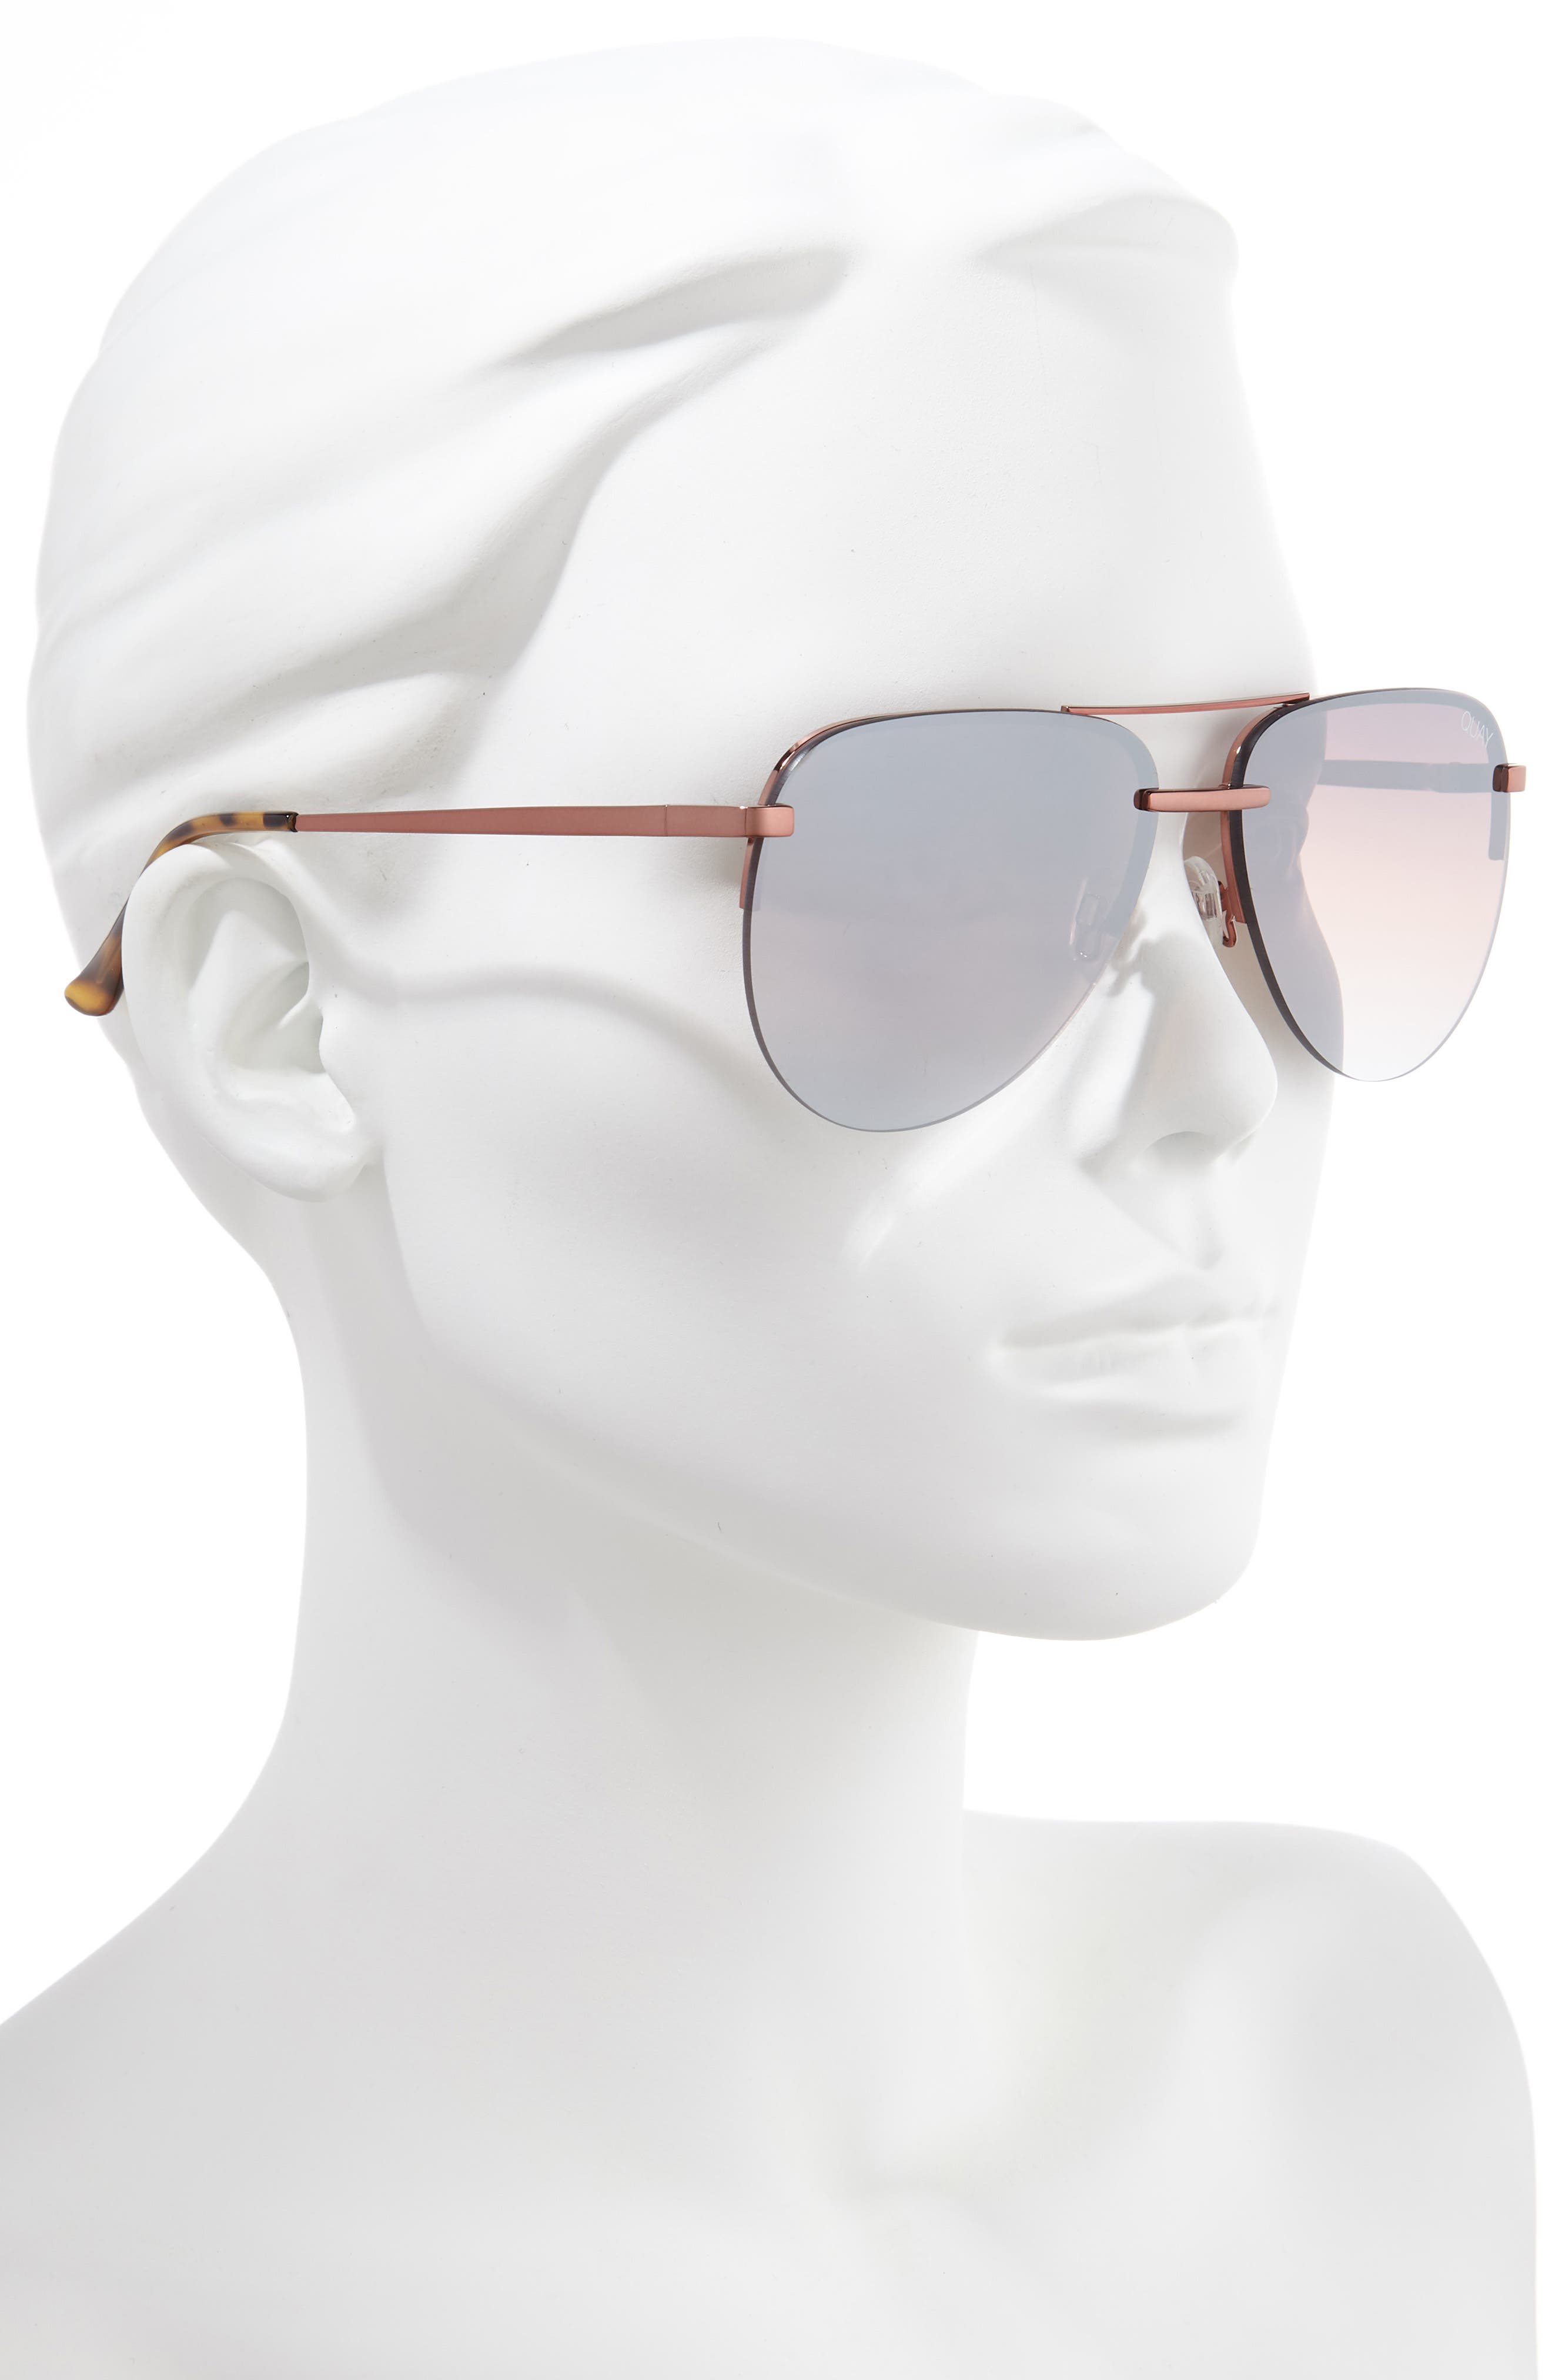 QUAY AUSTRALIA, x JLO The Playa 54mm Aviator Sunglasses, Alternate thumbnail 2, color, BRONZE/ BROWN